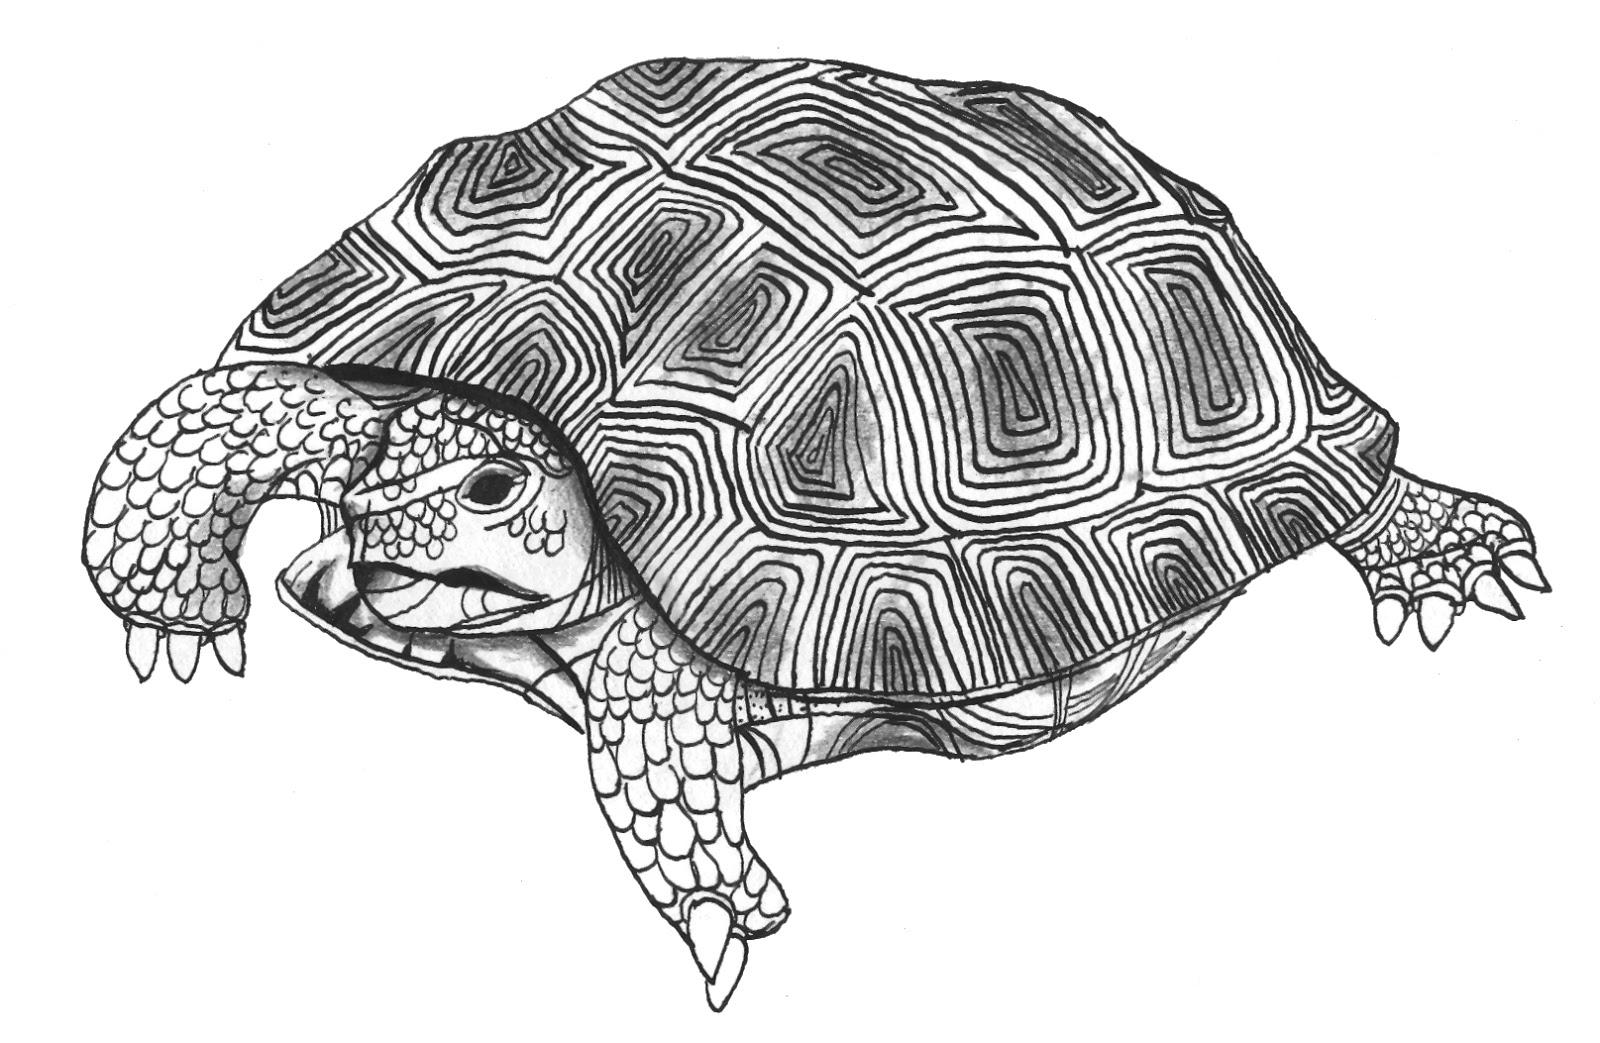 tortoise drawing for pinterest - photo #47